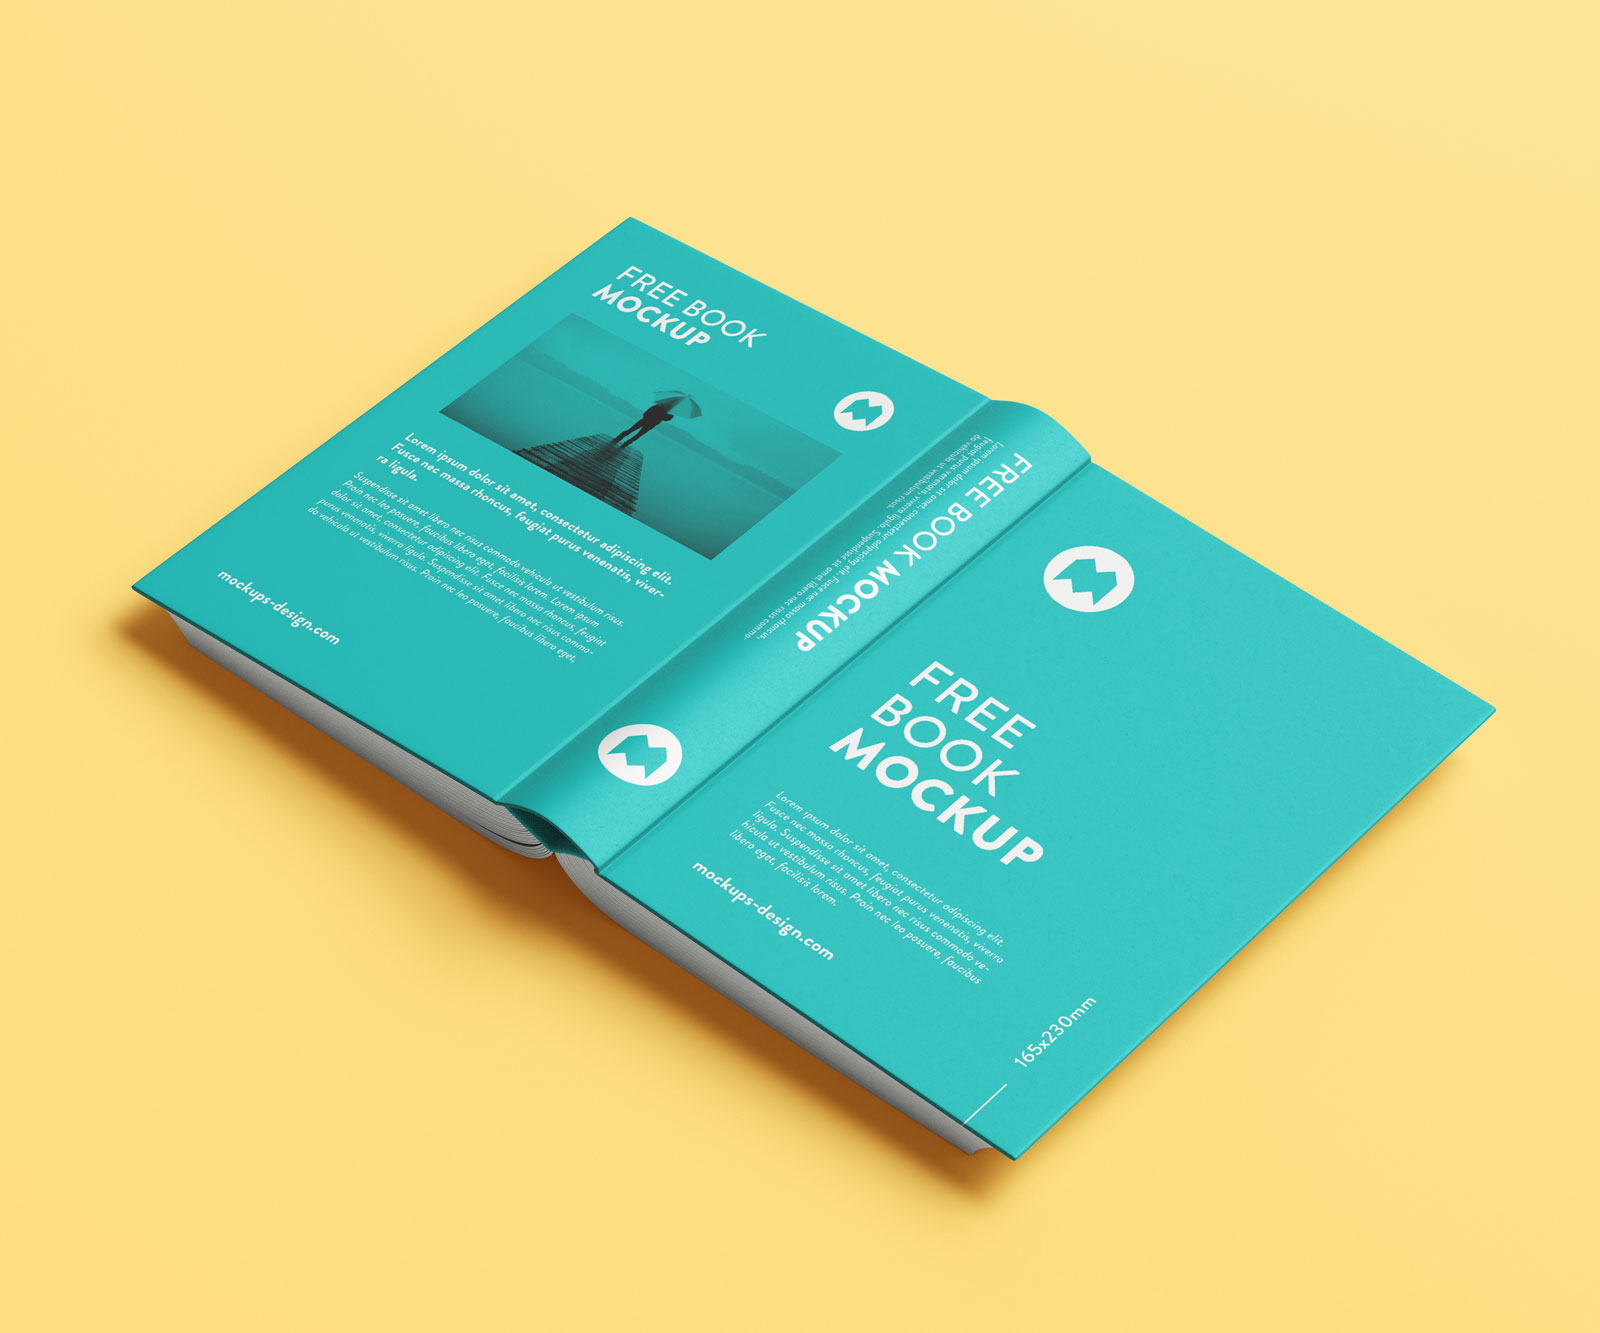 Free-Premium-Thick-Book-Mockup-PSD-4